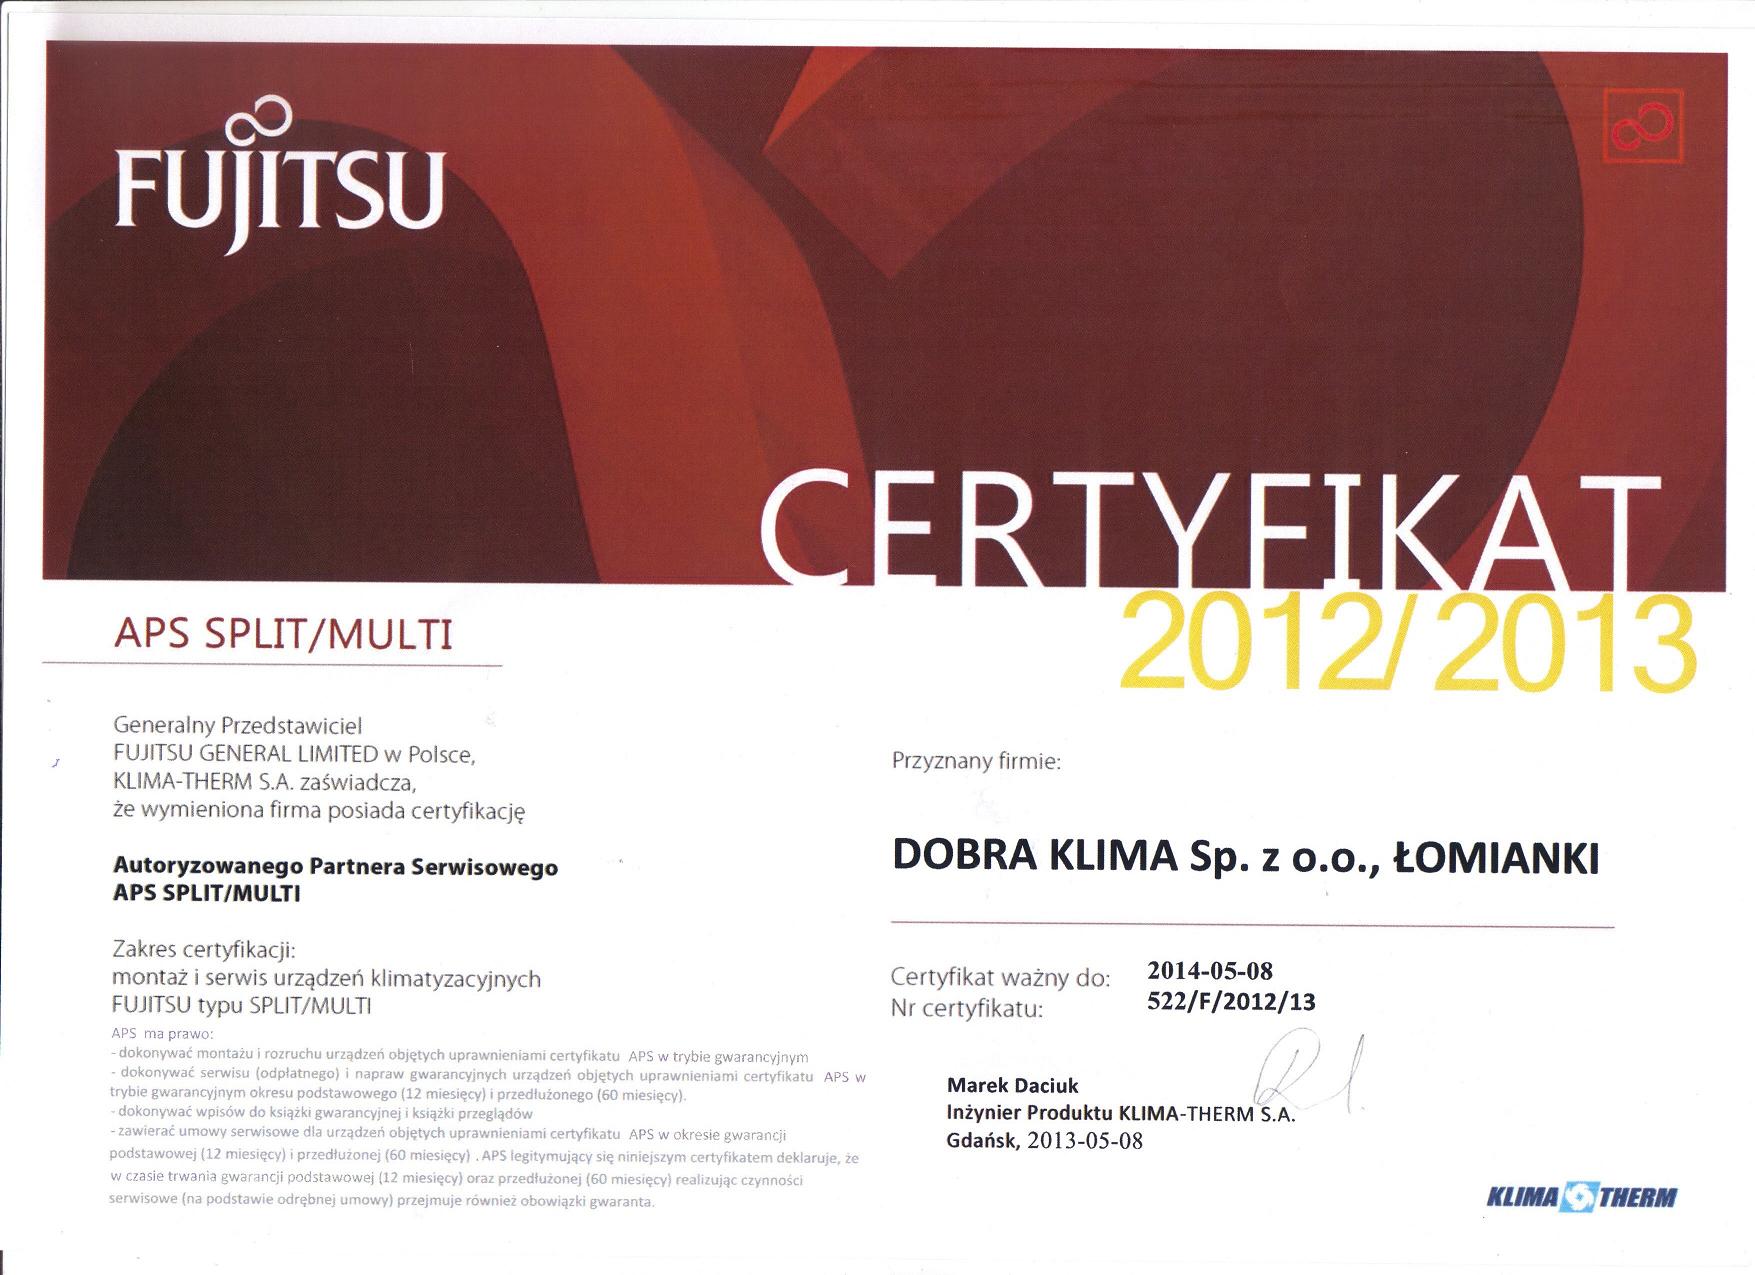 2013-certyfikat-fujitsu